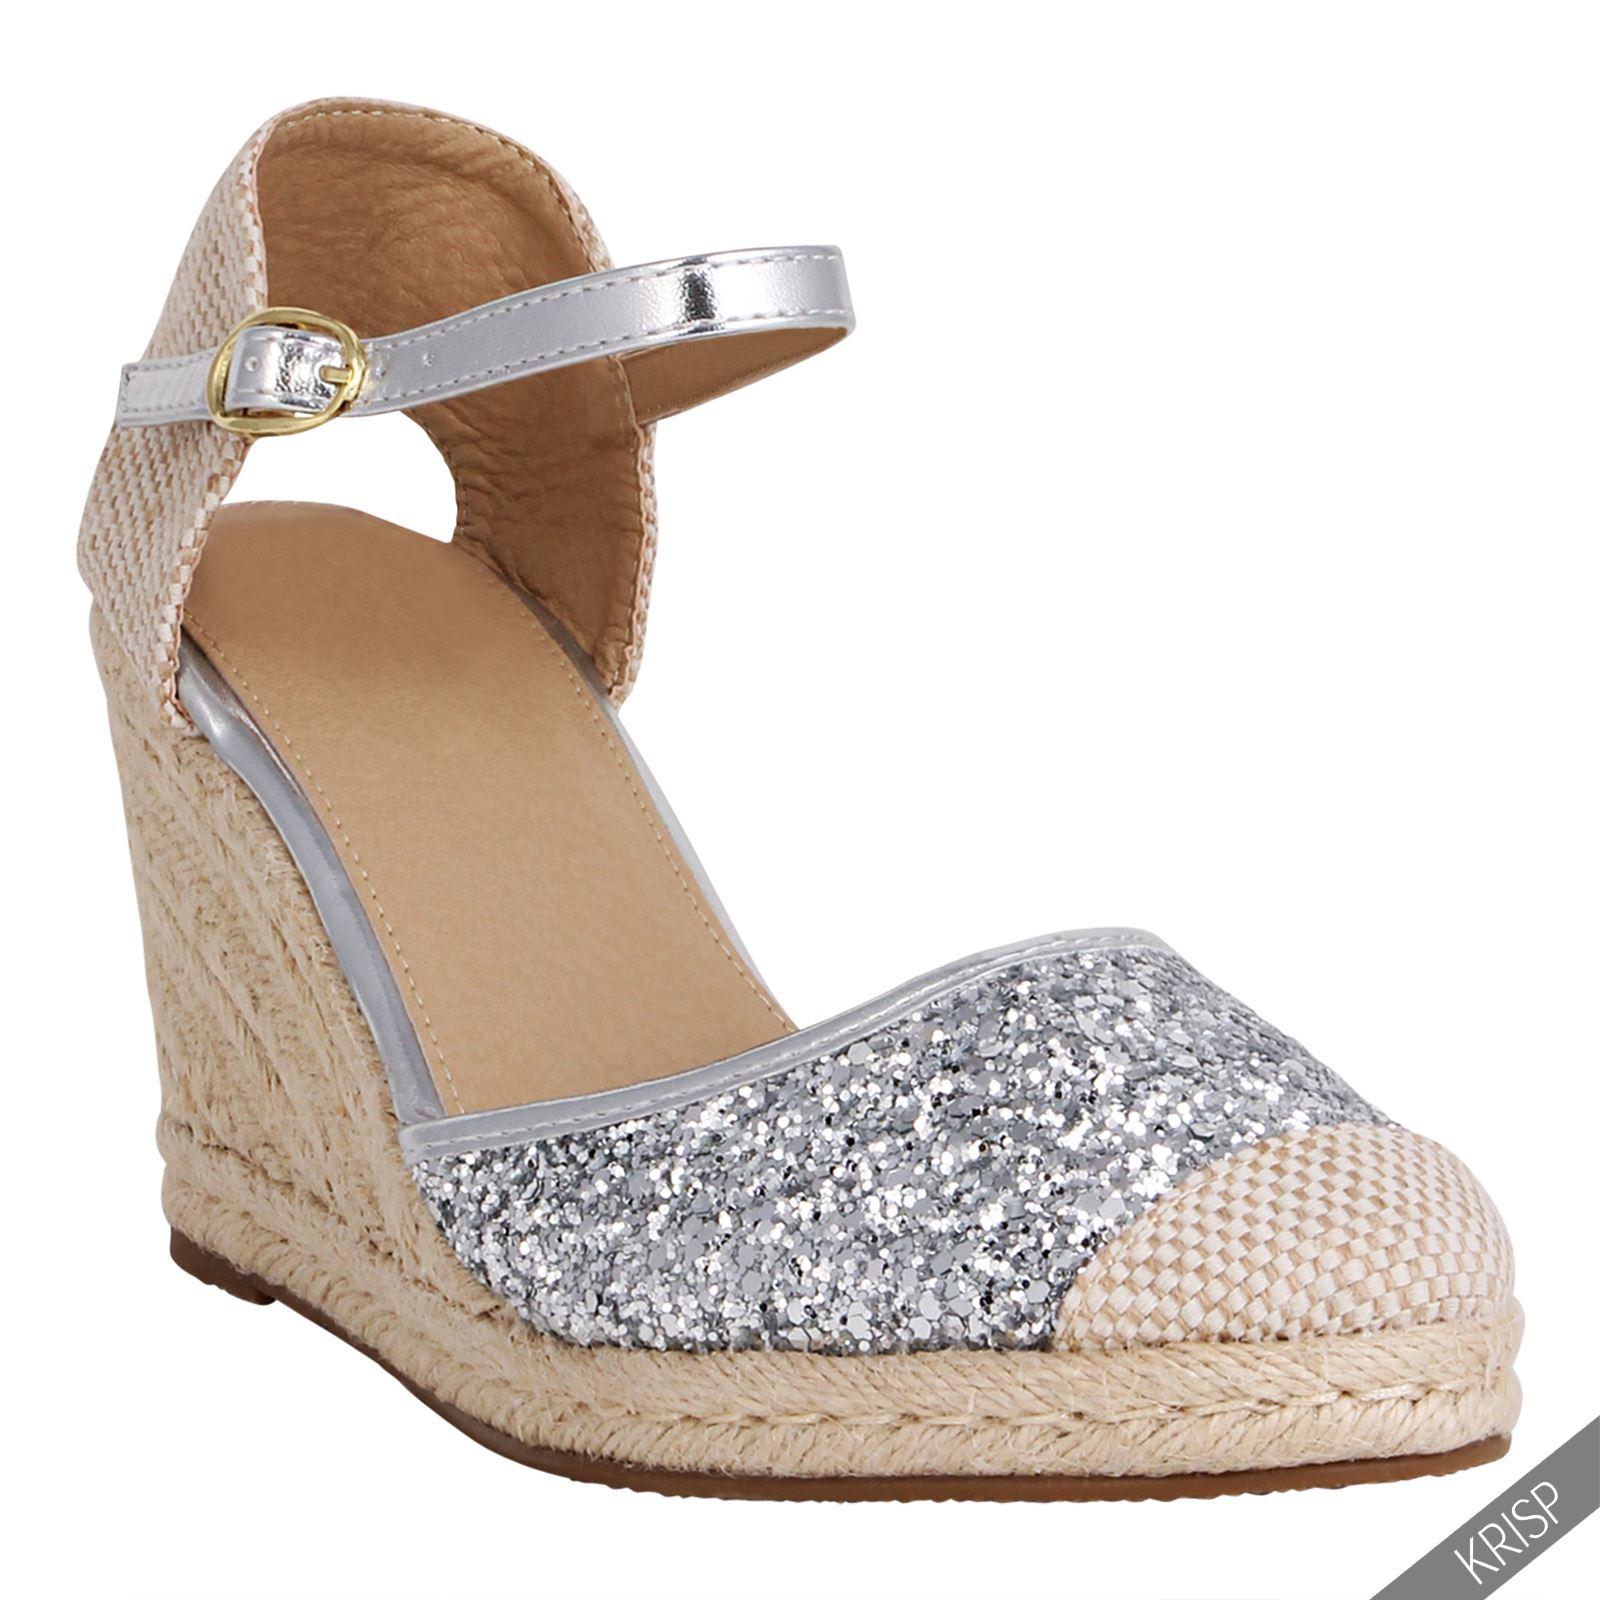 Womens Glitter Summer Espadrille Sandals High Heel Wedge ...